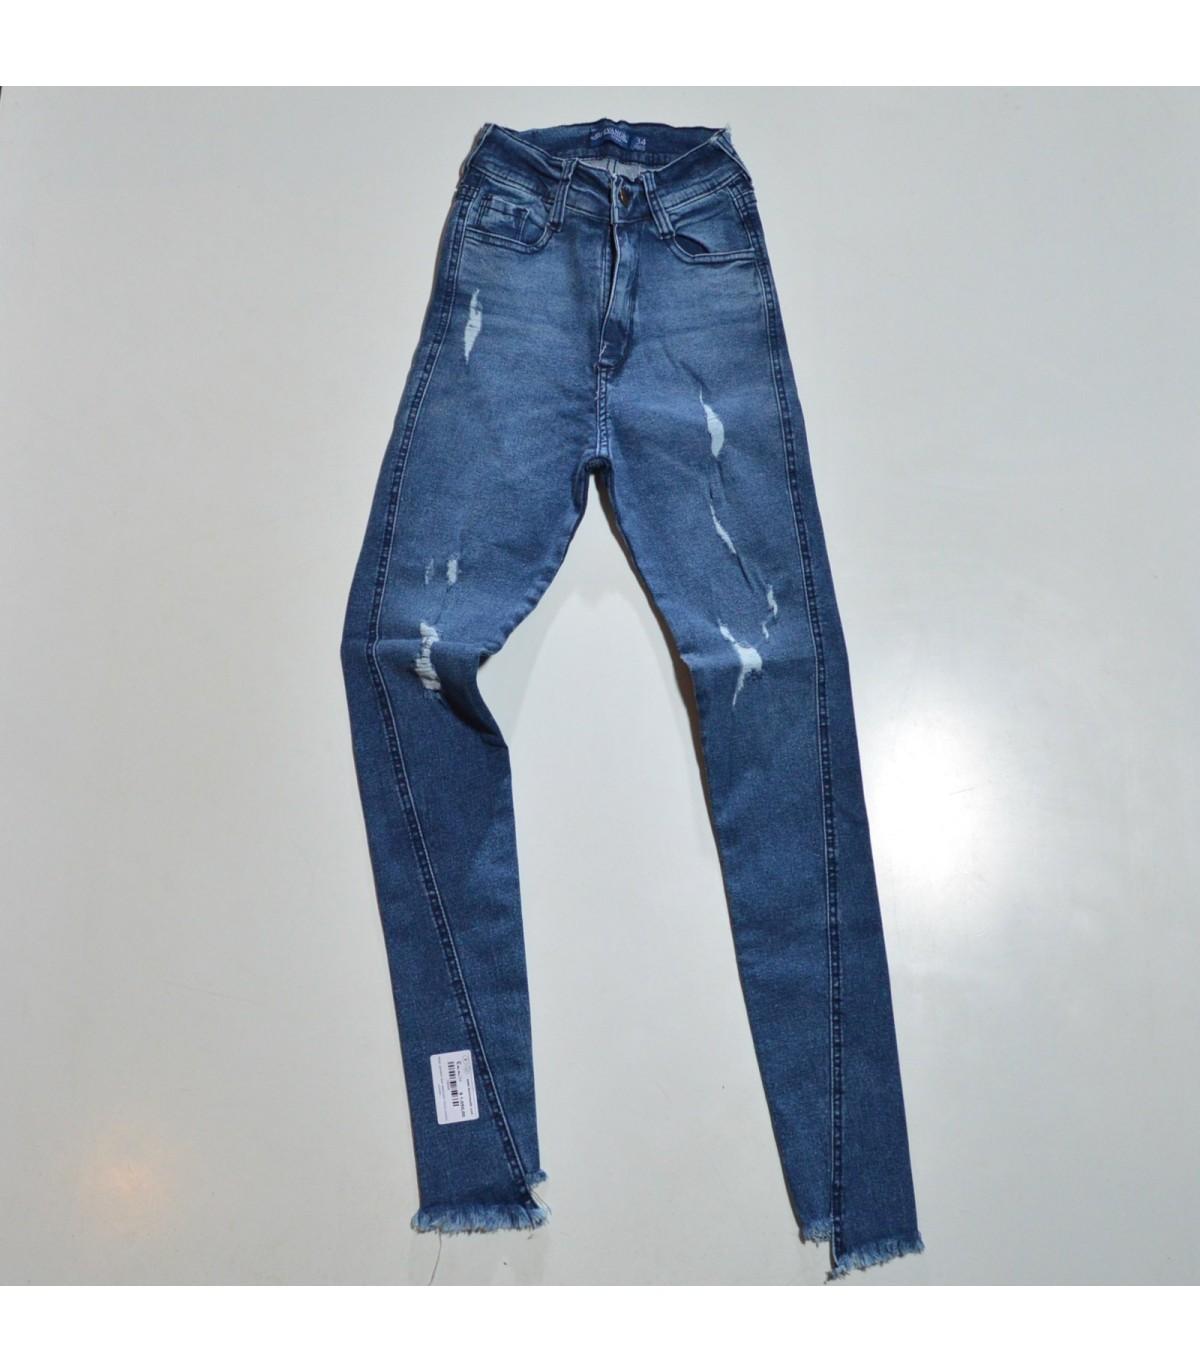 Mujer Pantalon Jean Elastizado Rotura Costura Cruzado